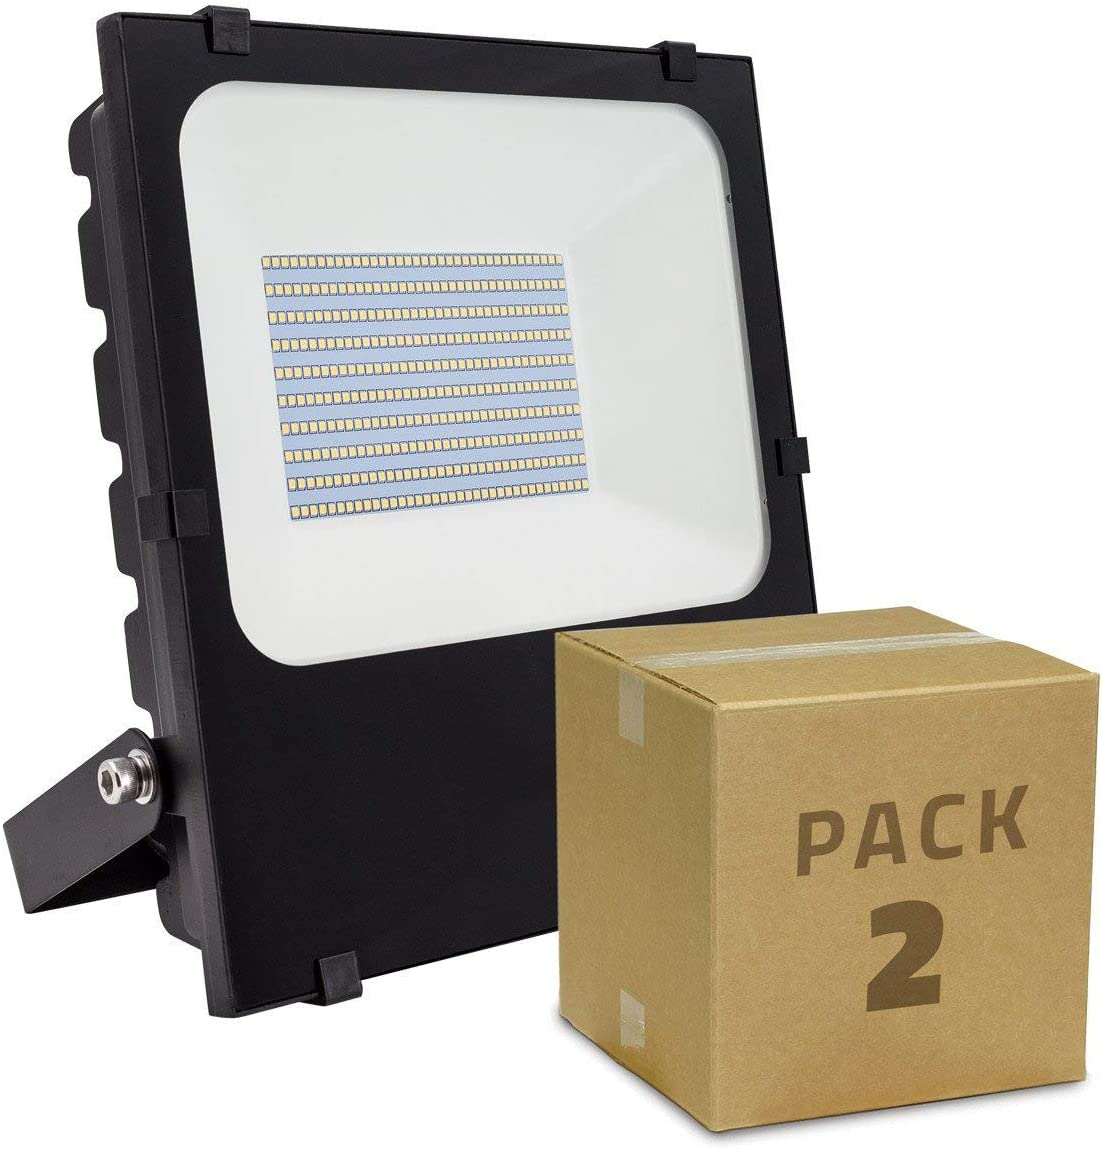 LEDKIA LIGHTING Pack Foco Proyector LED SMD 50W 135lm/W HE PRO (2 un) Blanco Cálido 2800K - 3200K: Amazon.es: Iluminación